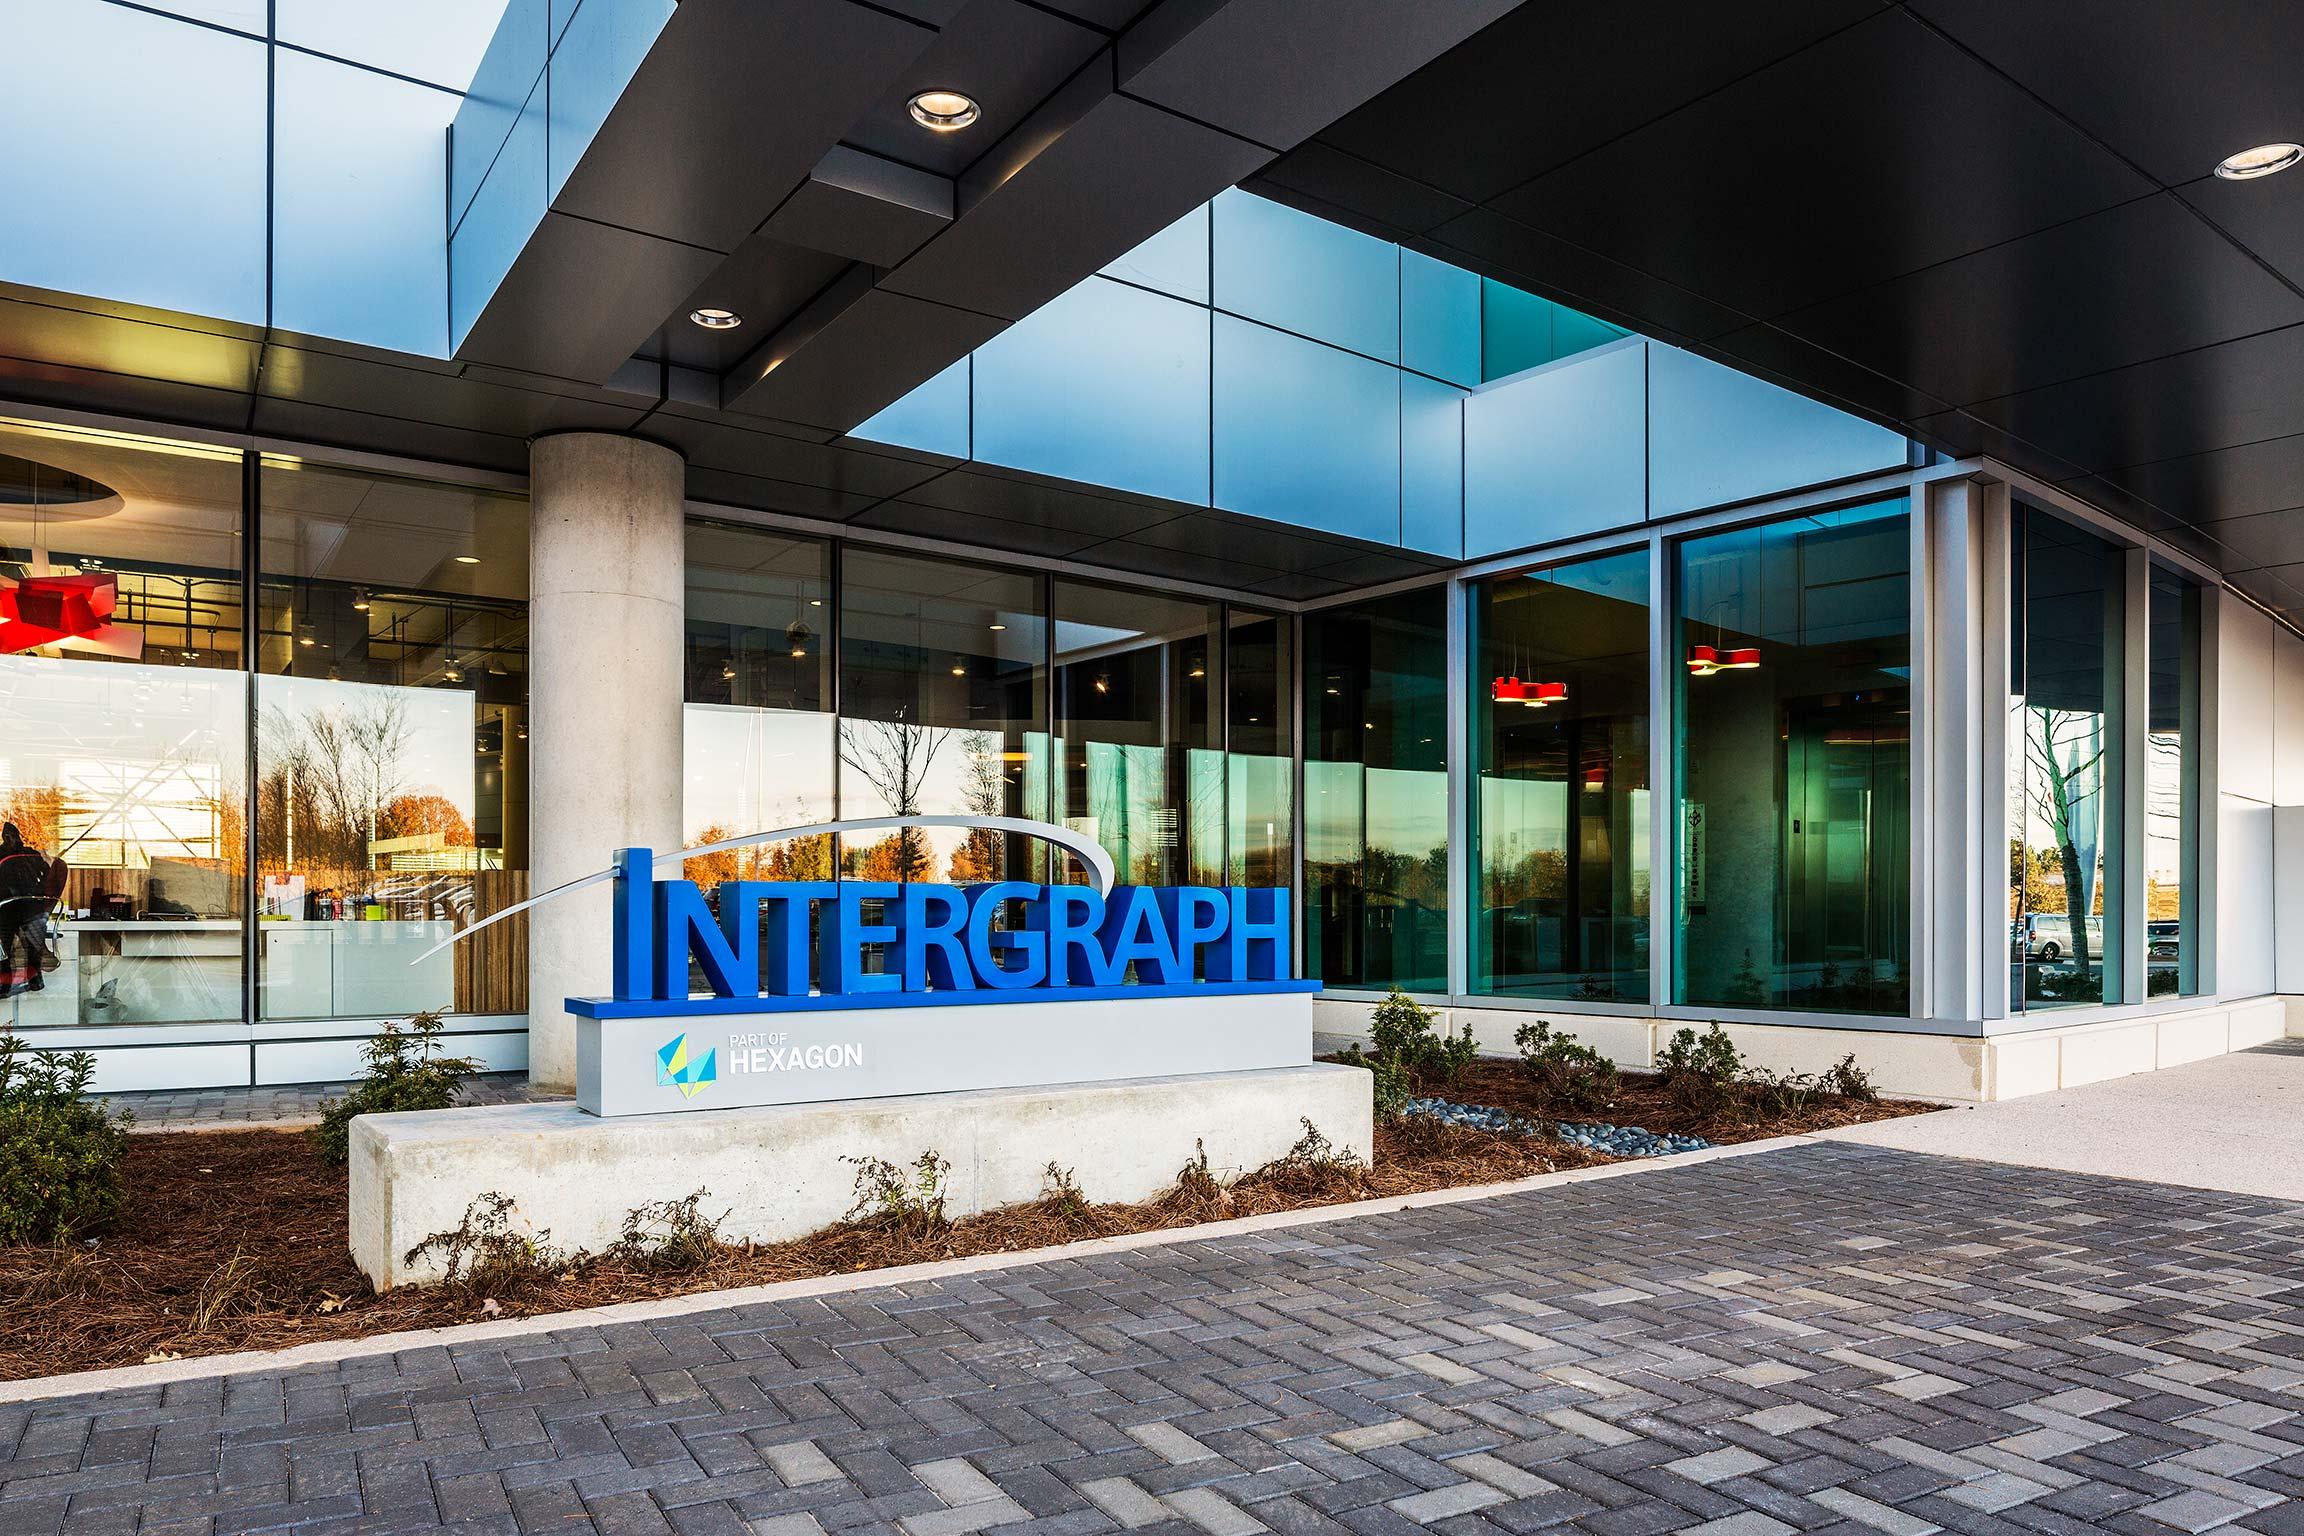 Entrance of Intergraph Headquarters